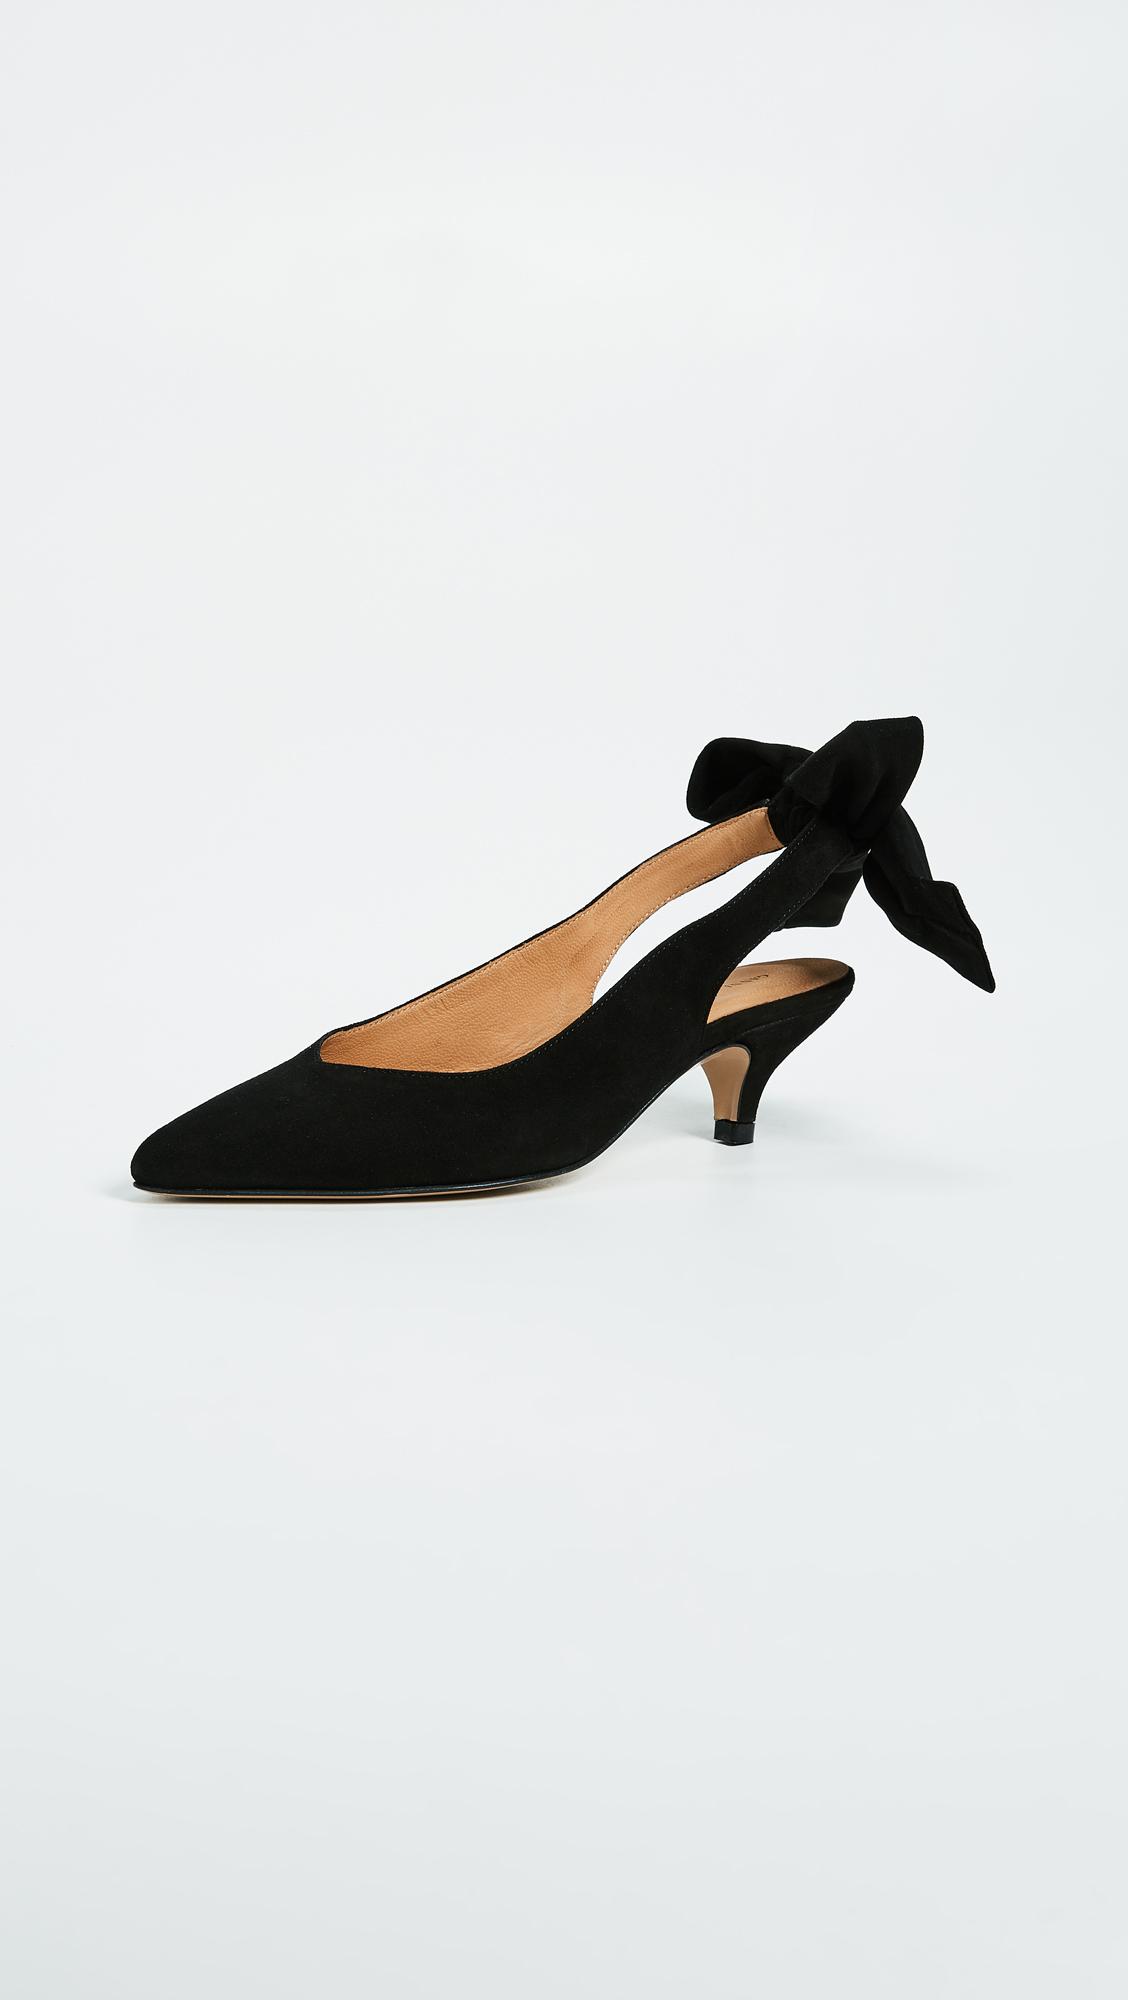 626ab3d6d91 GANNI Bow Kitten Heels